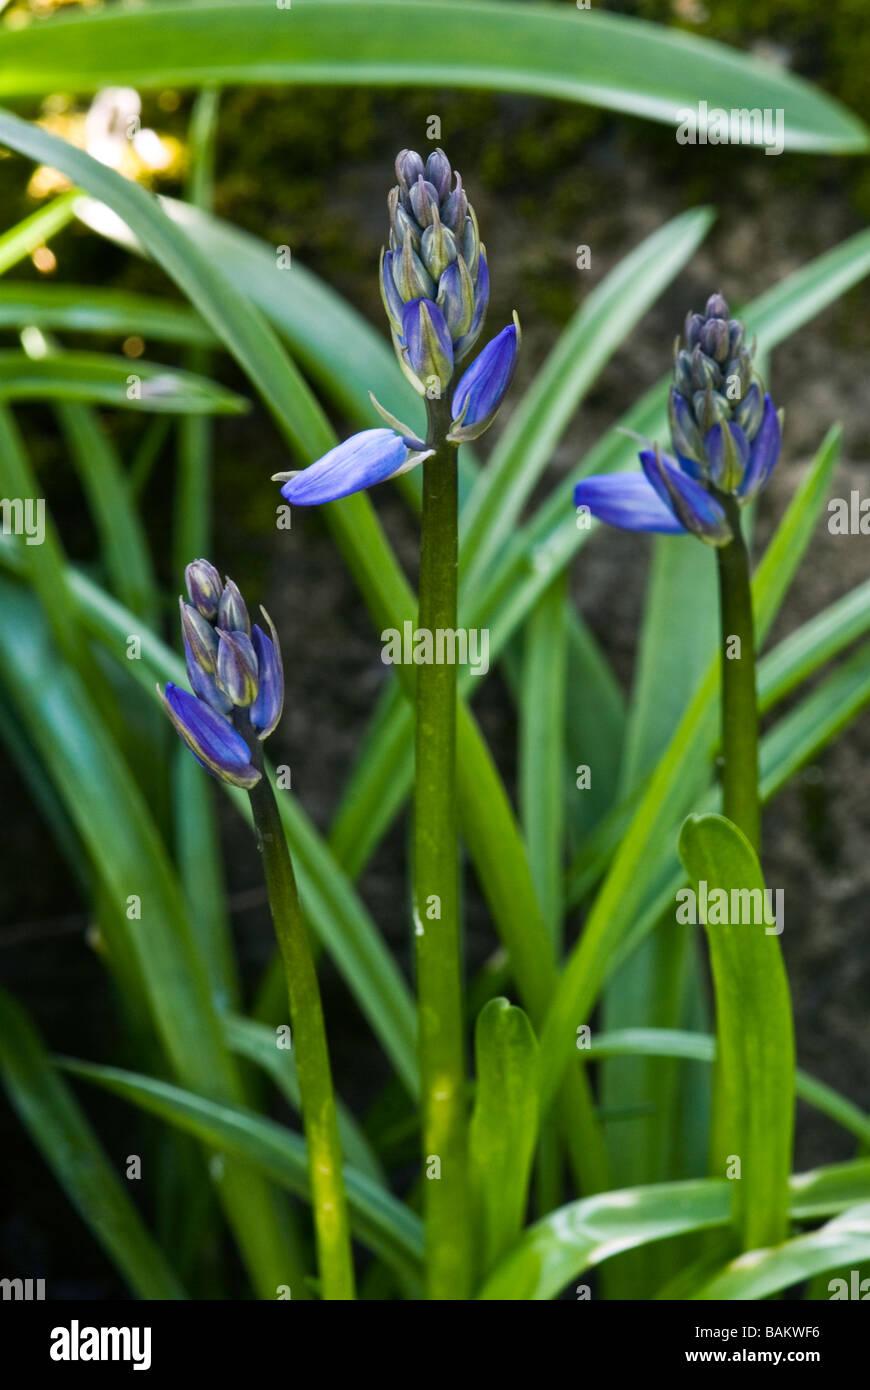 Hyacinthoides Hispanica, Spanisch Bluebell, Nahaufnahme detaillierte Schuss Stockbild